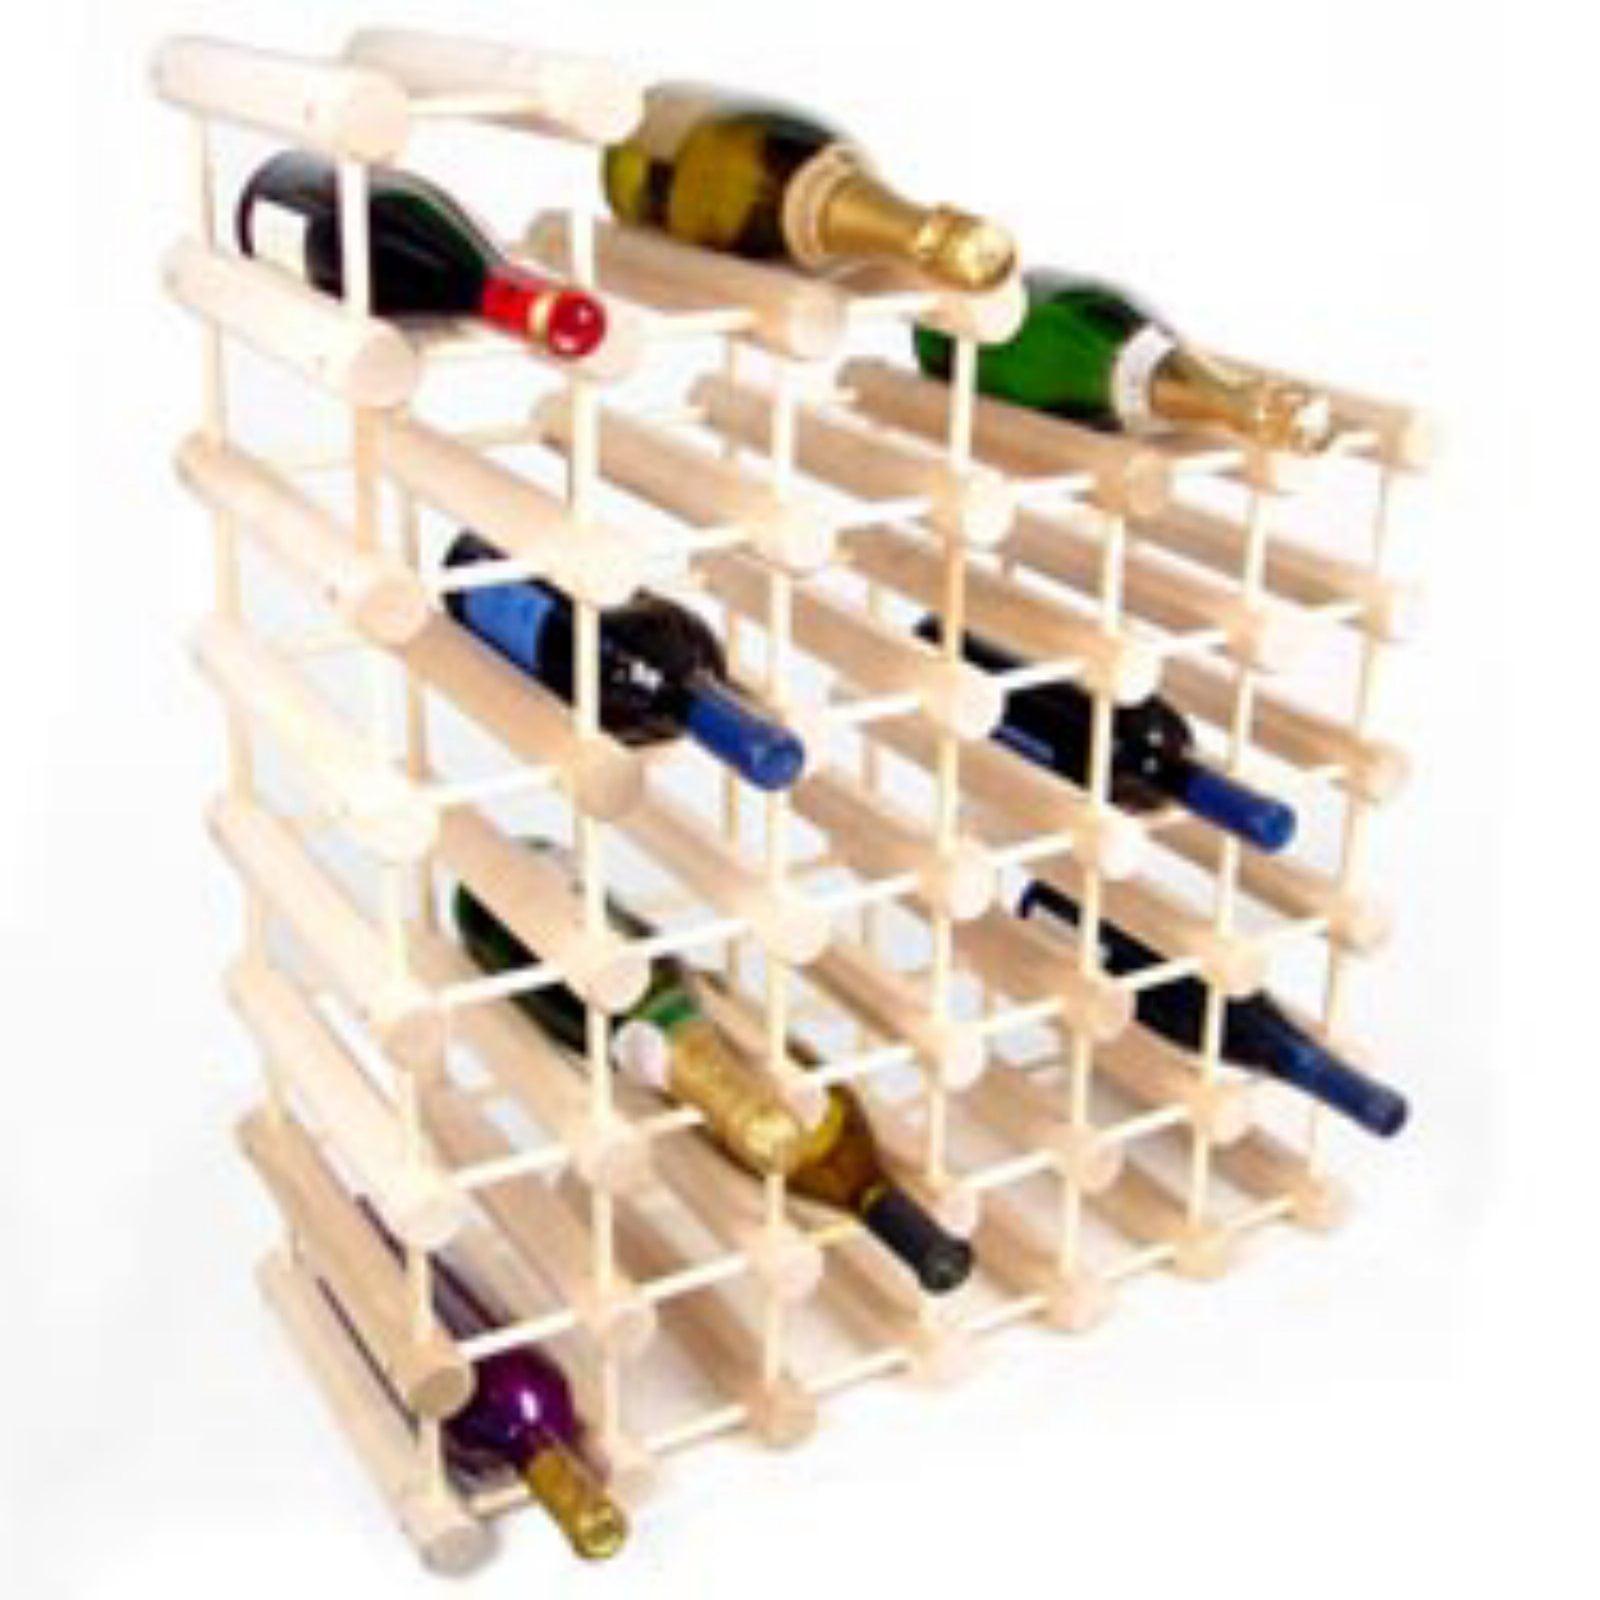 Wooden Octagonal Wine Rack - 12 or 40 Bottles